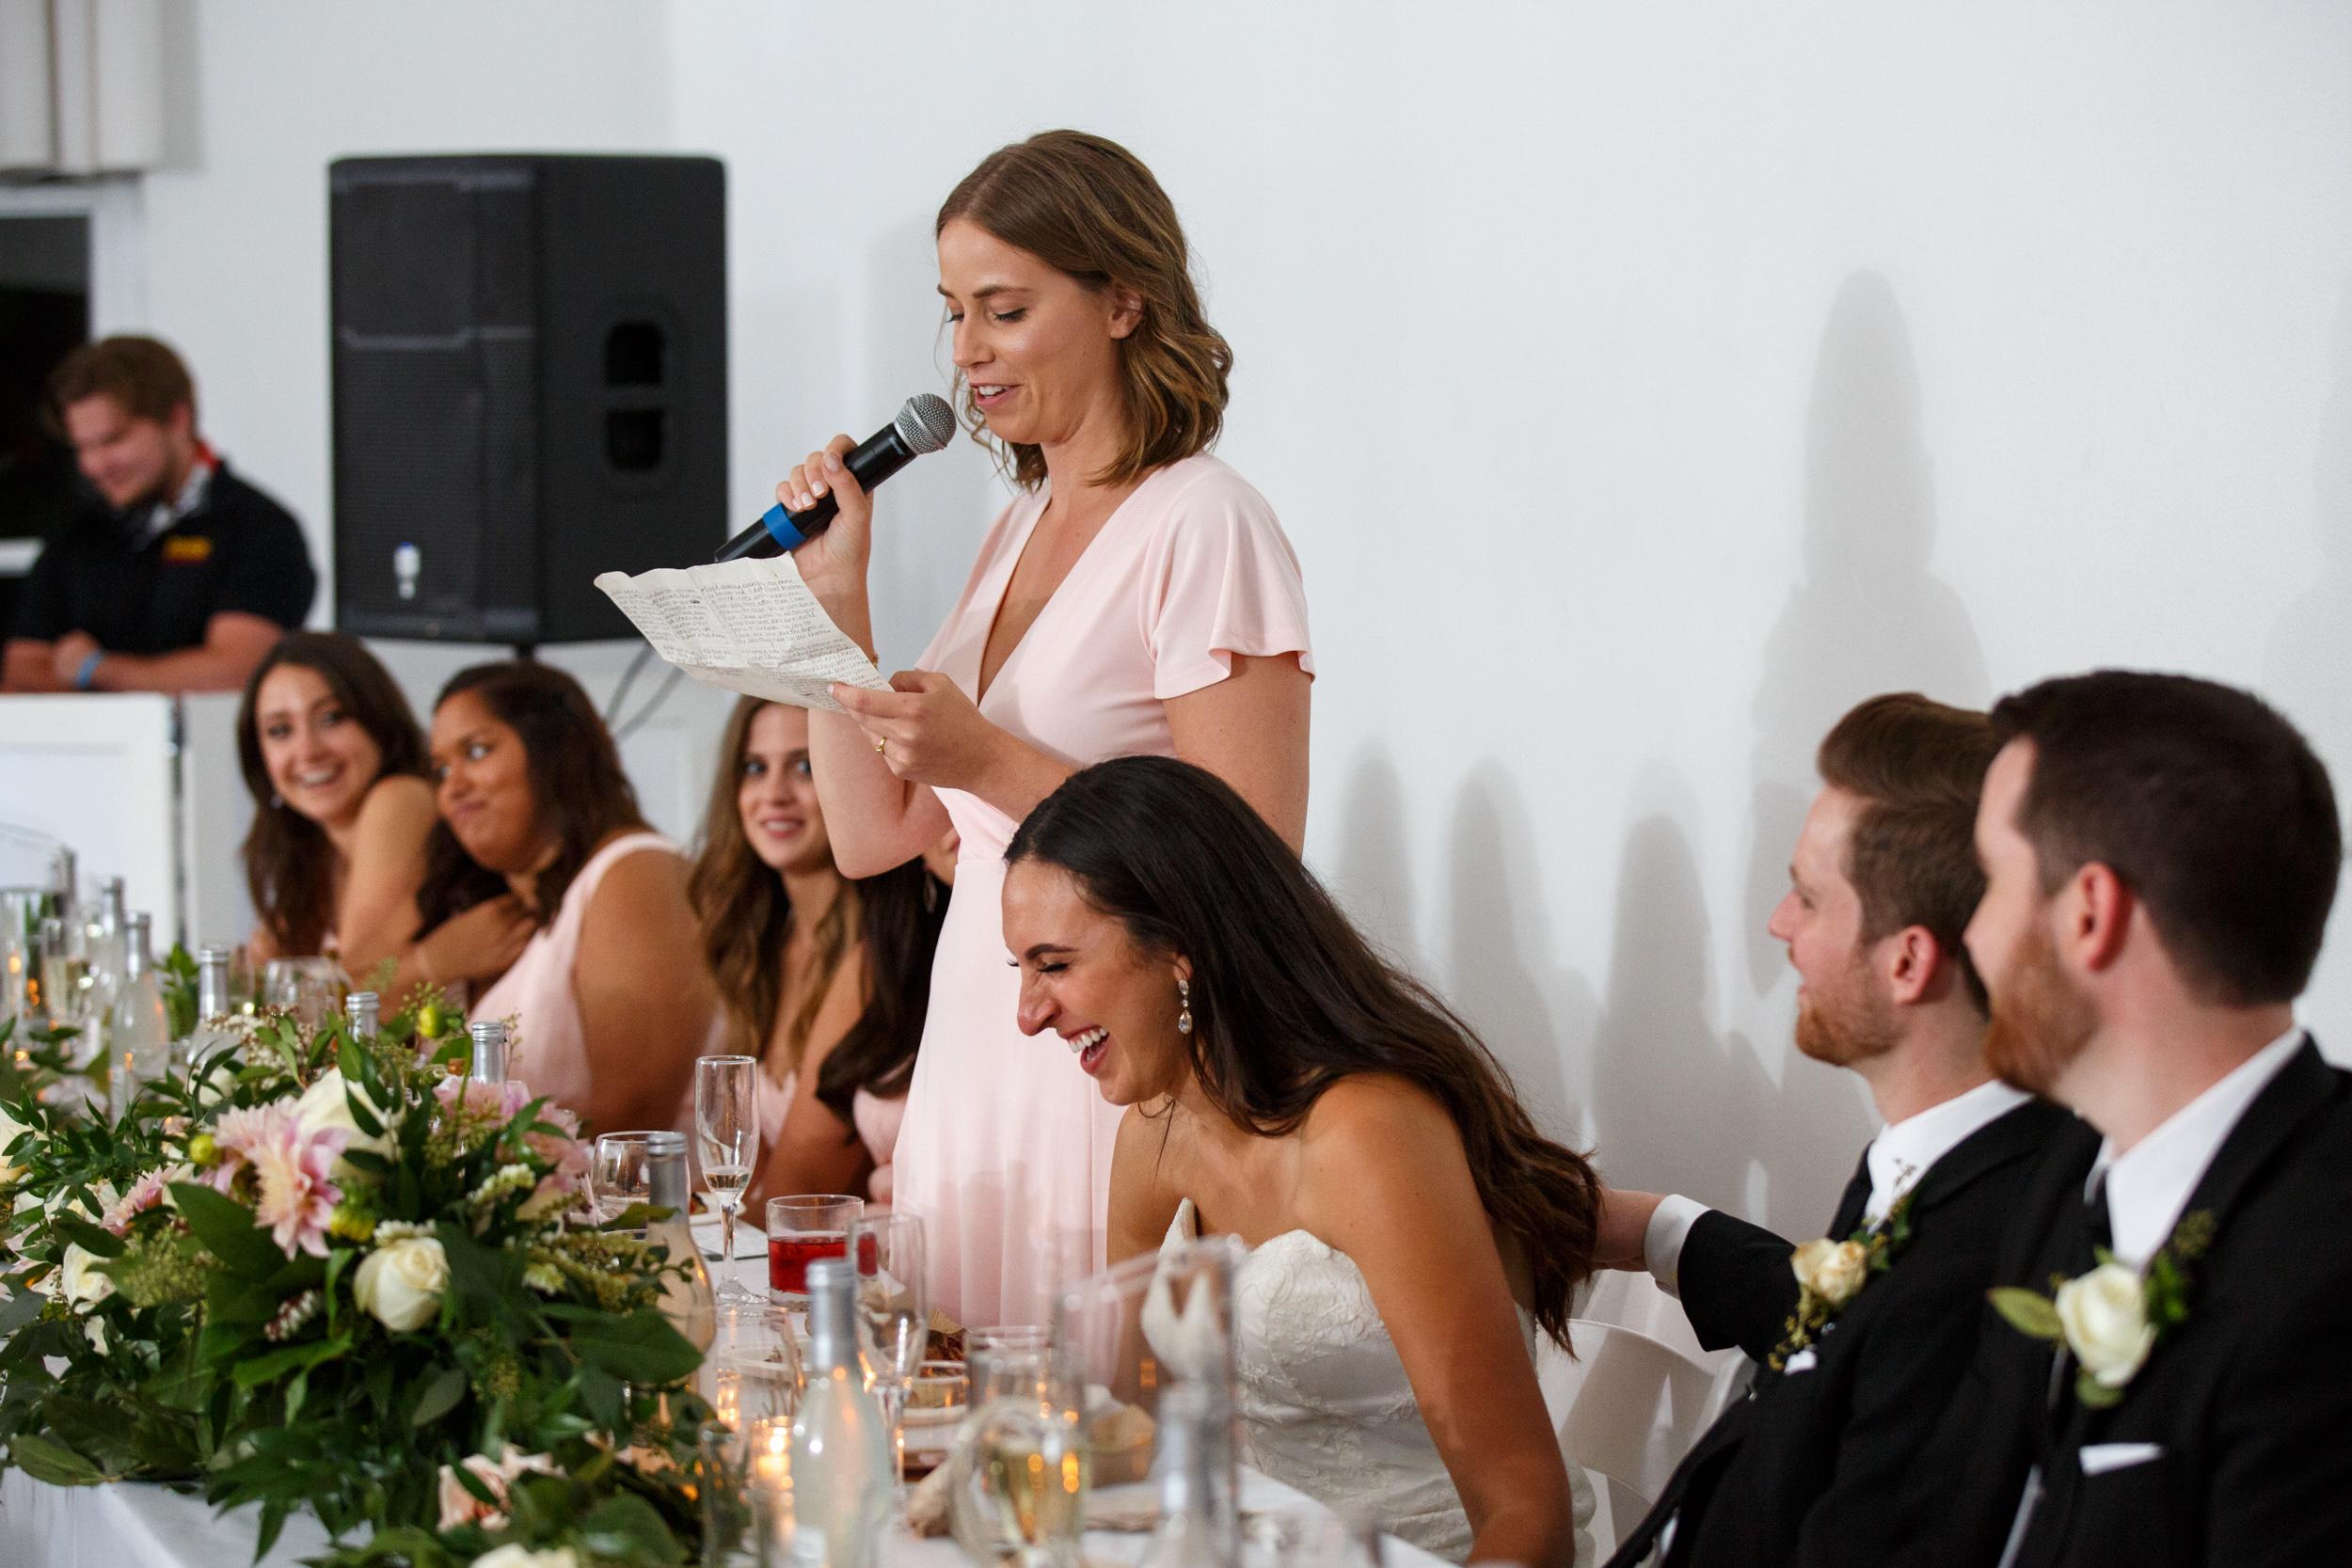 9-09-2016 Flora & Colin wedding photography by Brian Milo-178.jpg